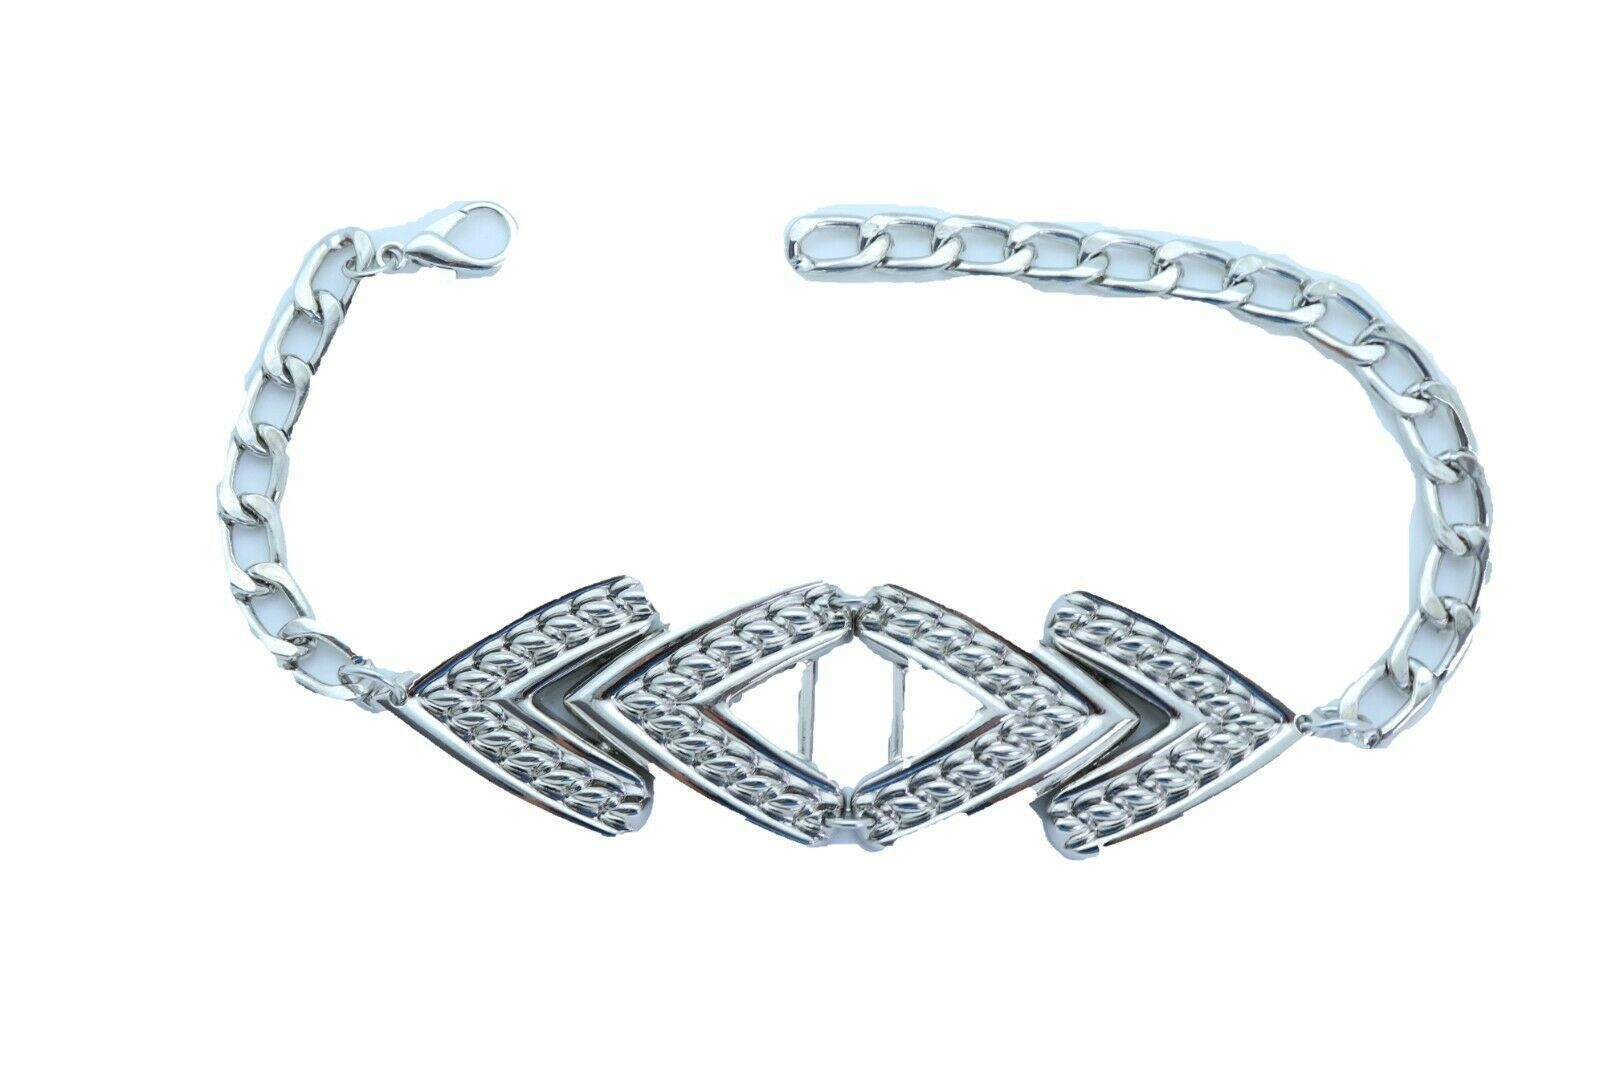 Sexy Women Silver Metal Chain Boot Bracelet Anklet Shoe Arrow Band Charm Jewelry